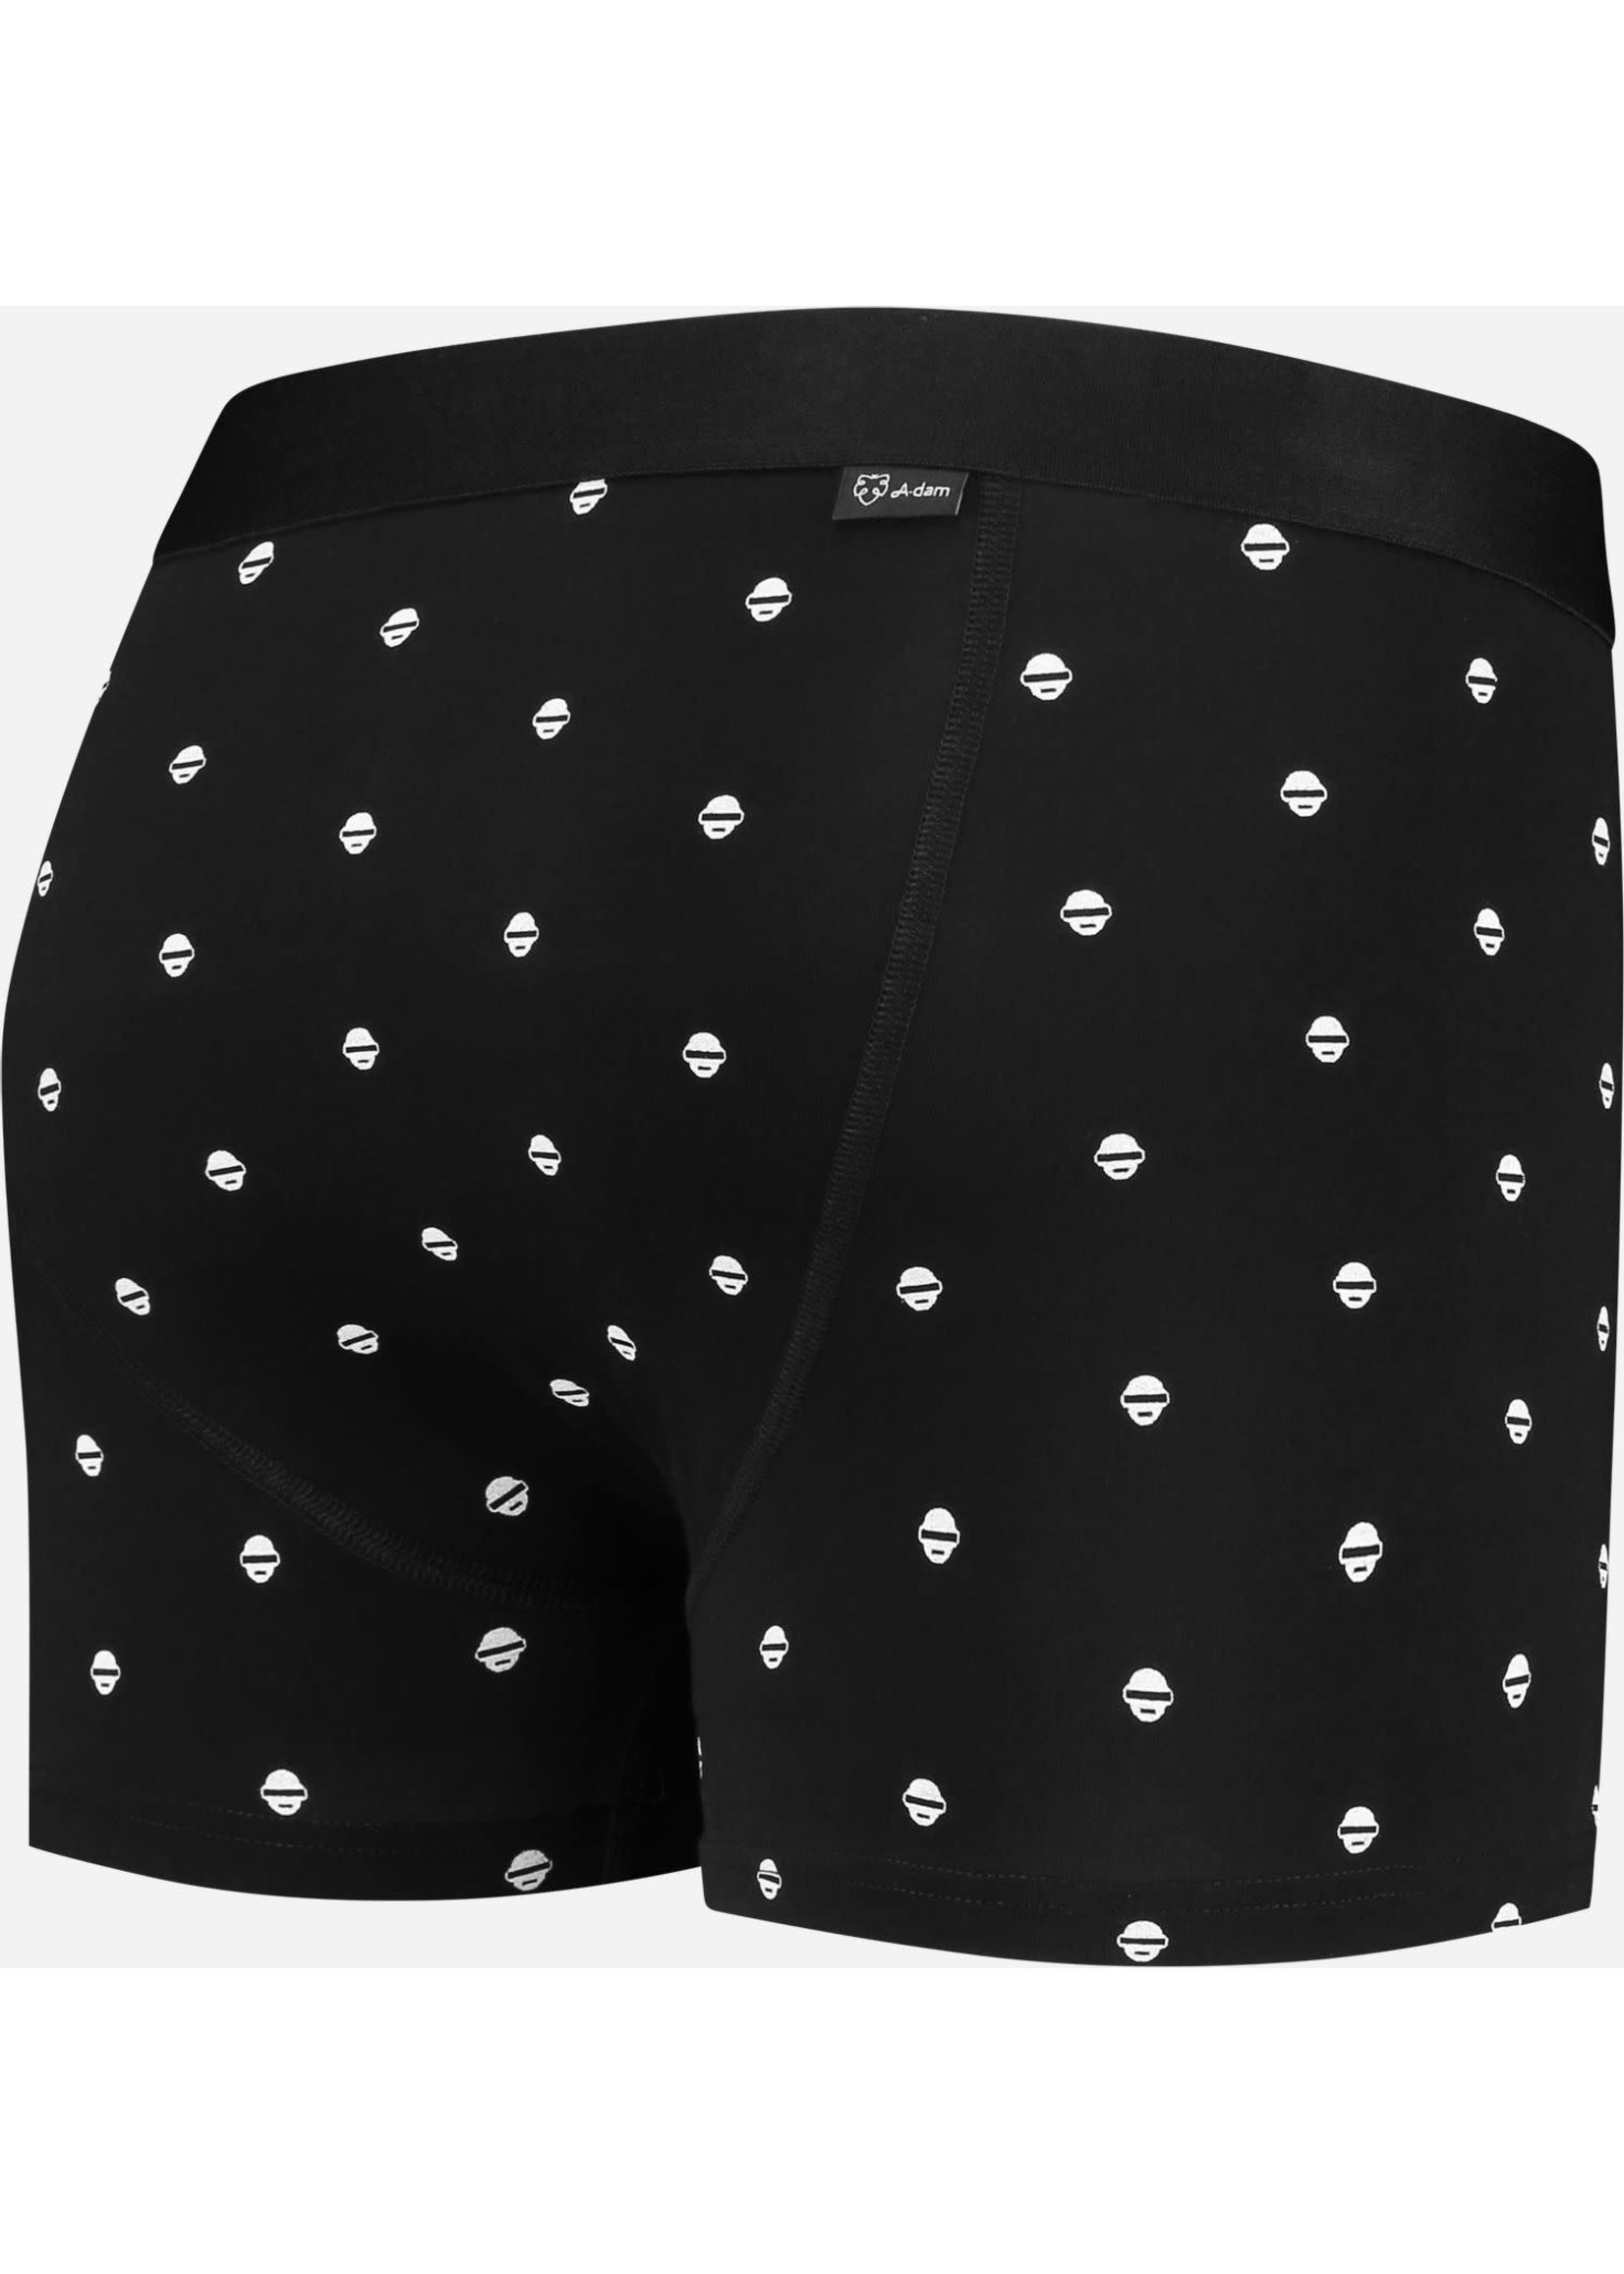 A-dam Underwear boxer Darre